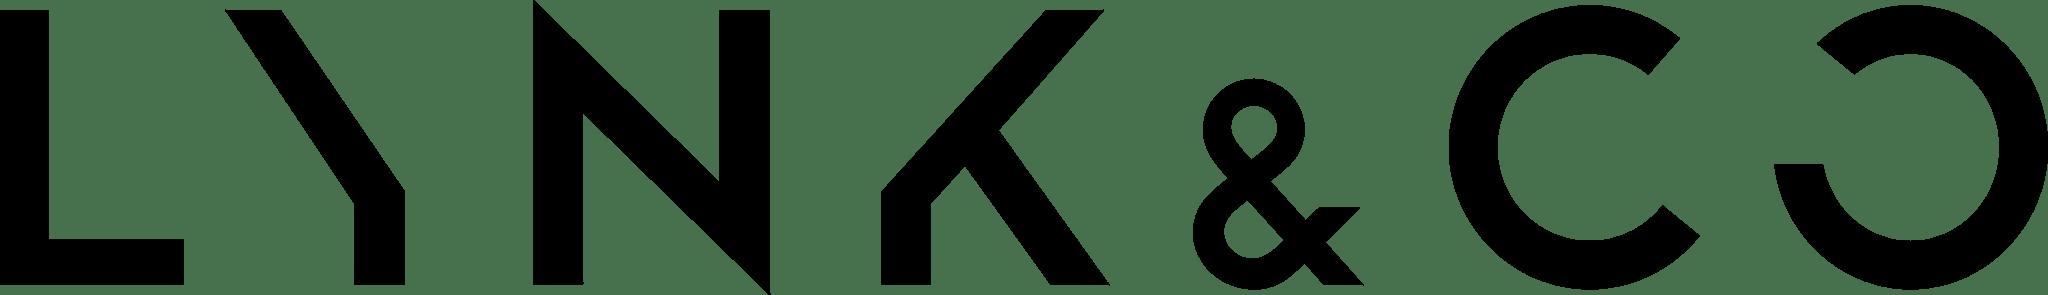 Lynk & Co Logo